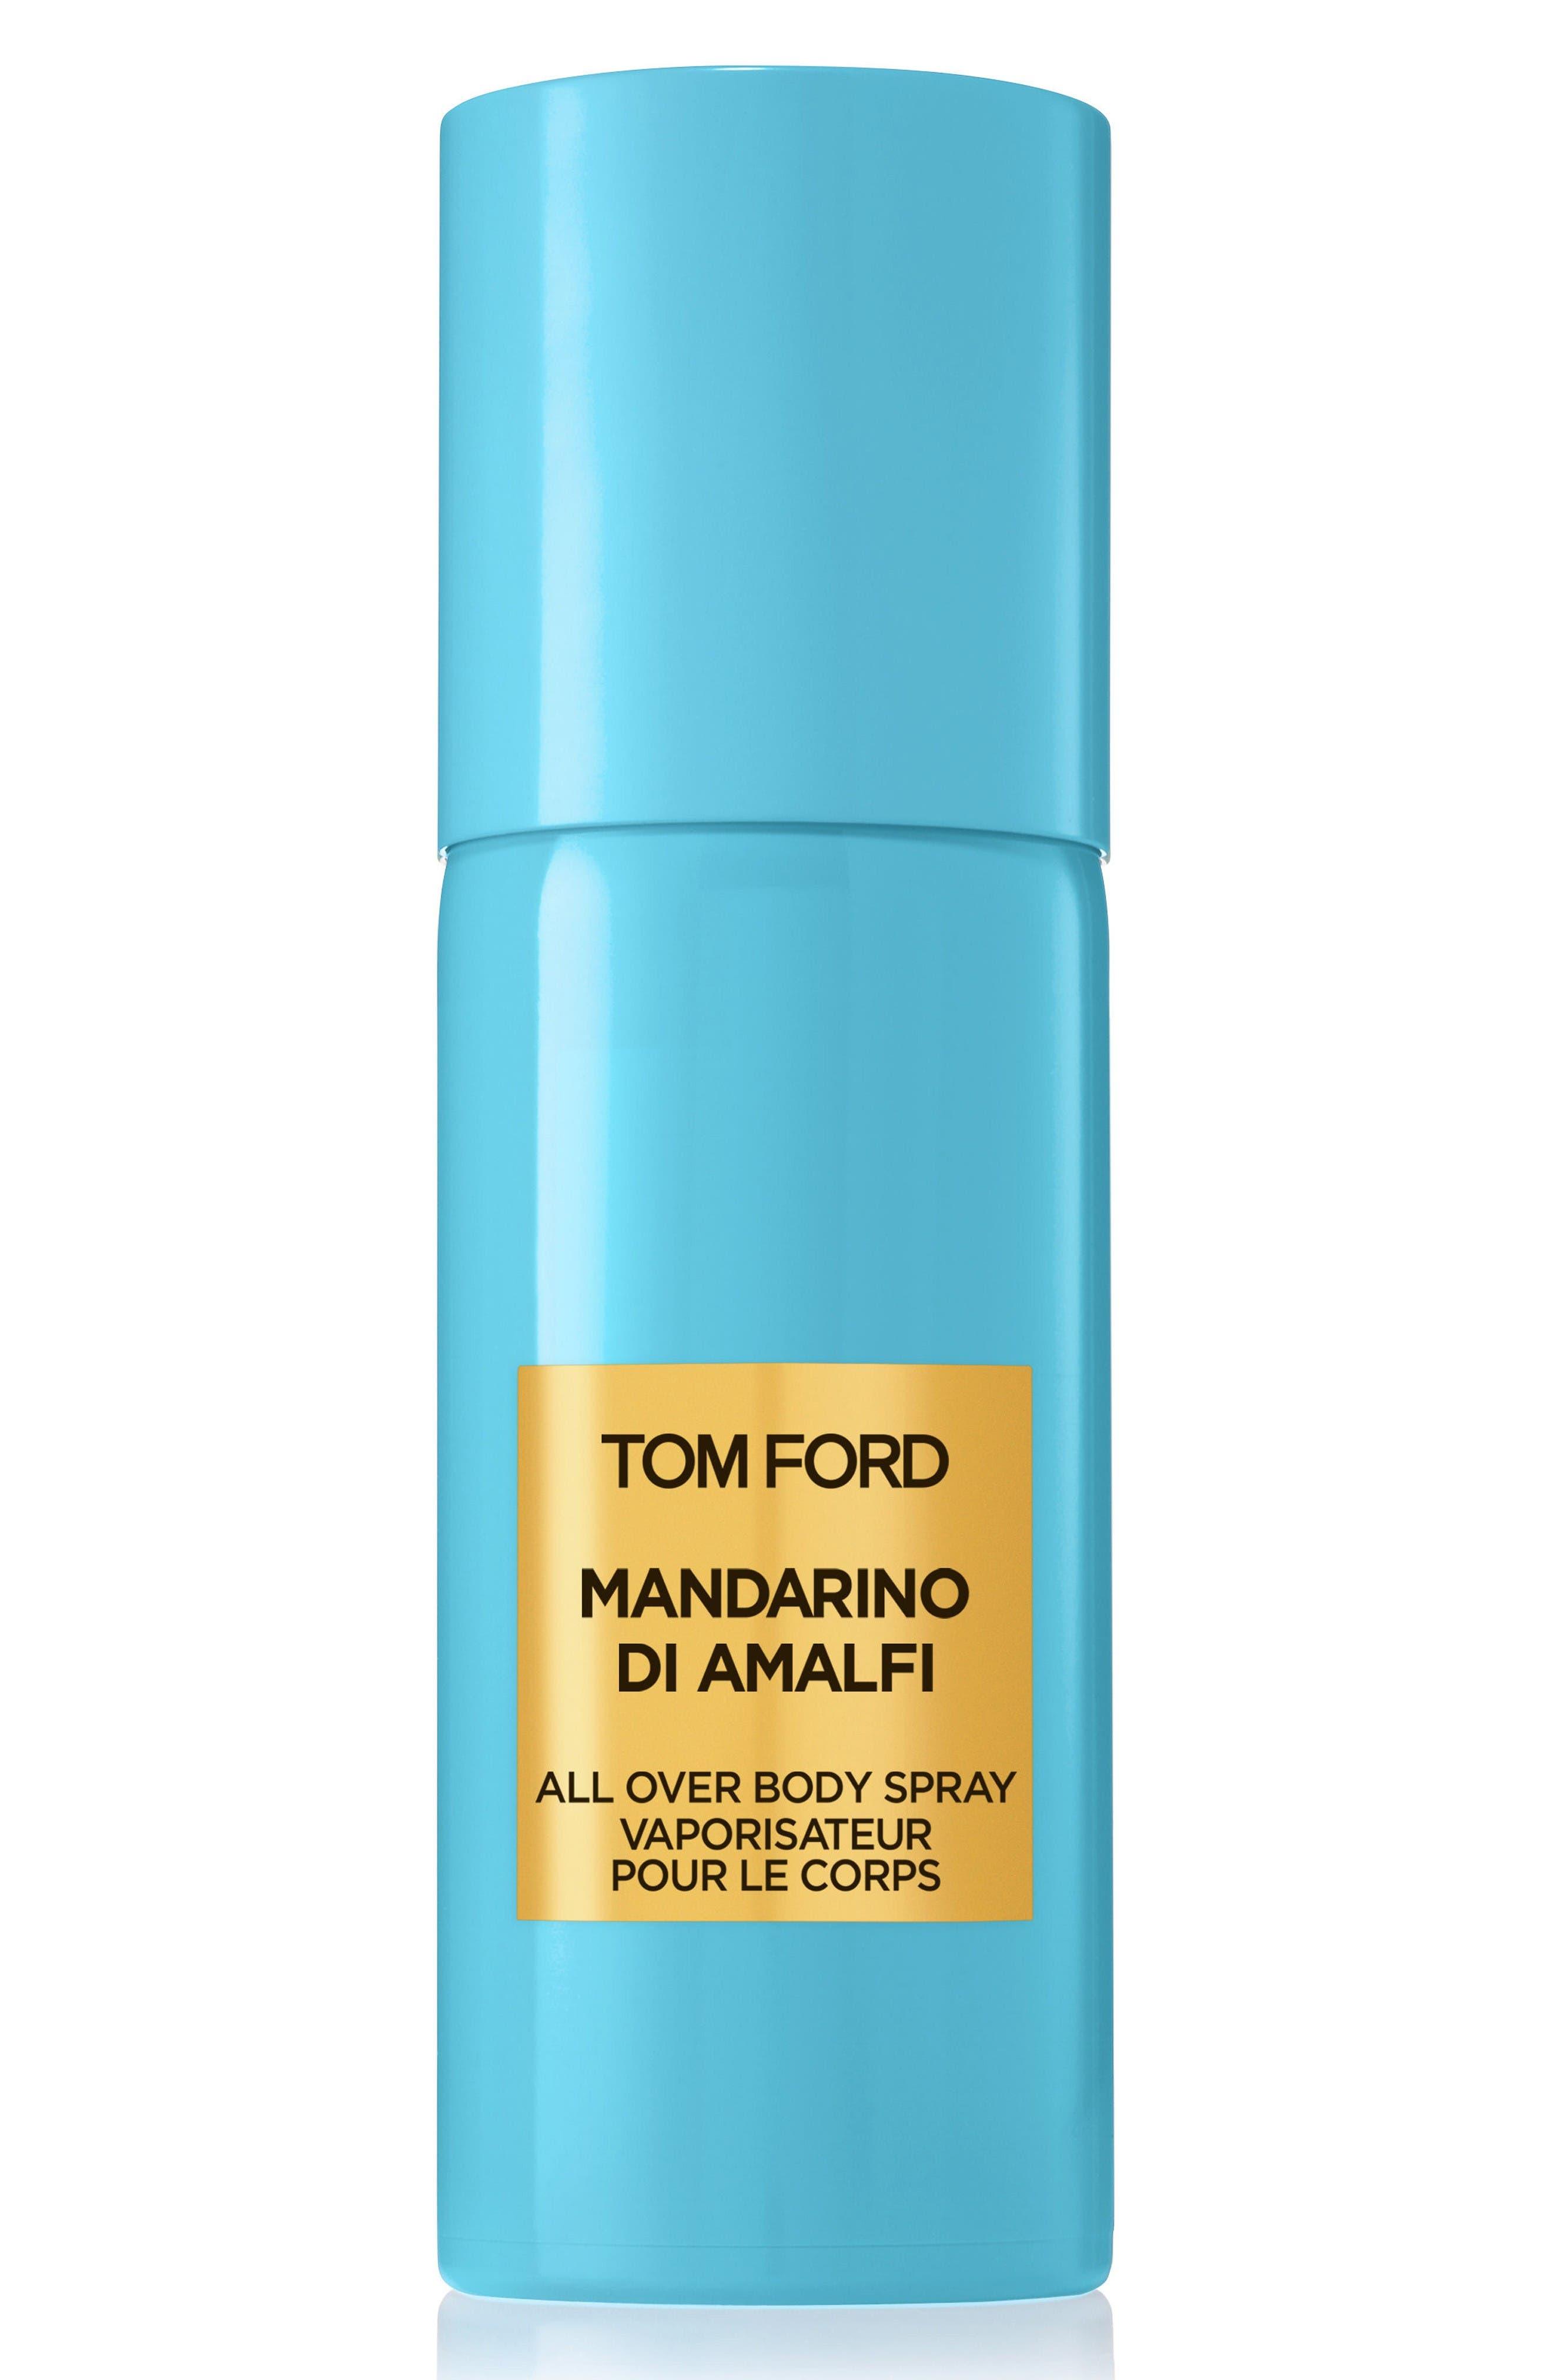 Tom Ford Private Blend Mandarino di Amalfi All Over Body Spray